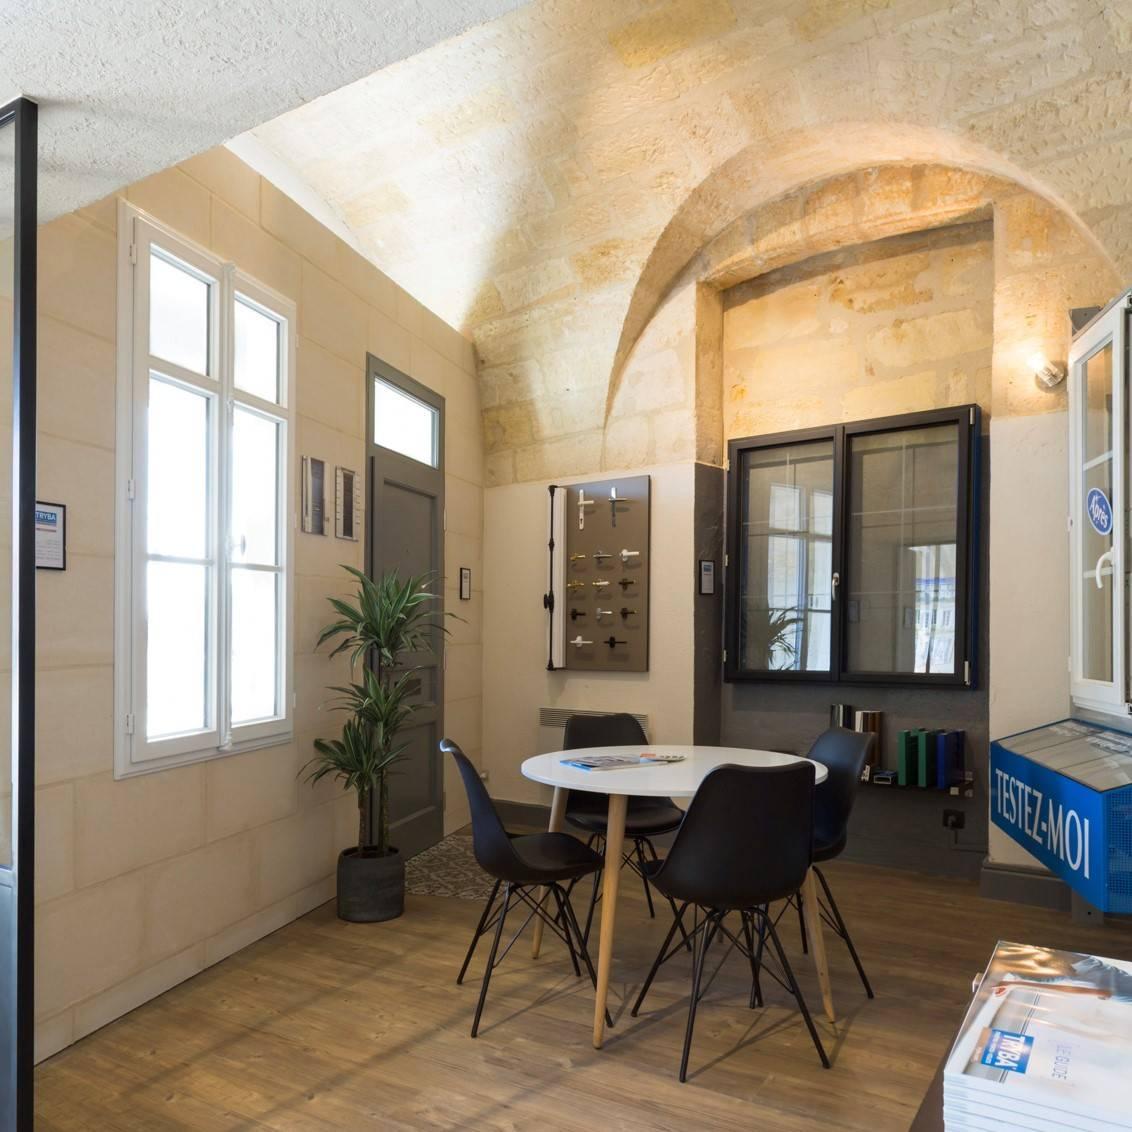 menuiserie bordeaux agr menuiseries. Black Bedroom Furniture Sets. Home Design Ideas